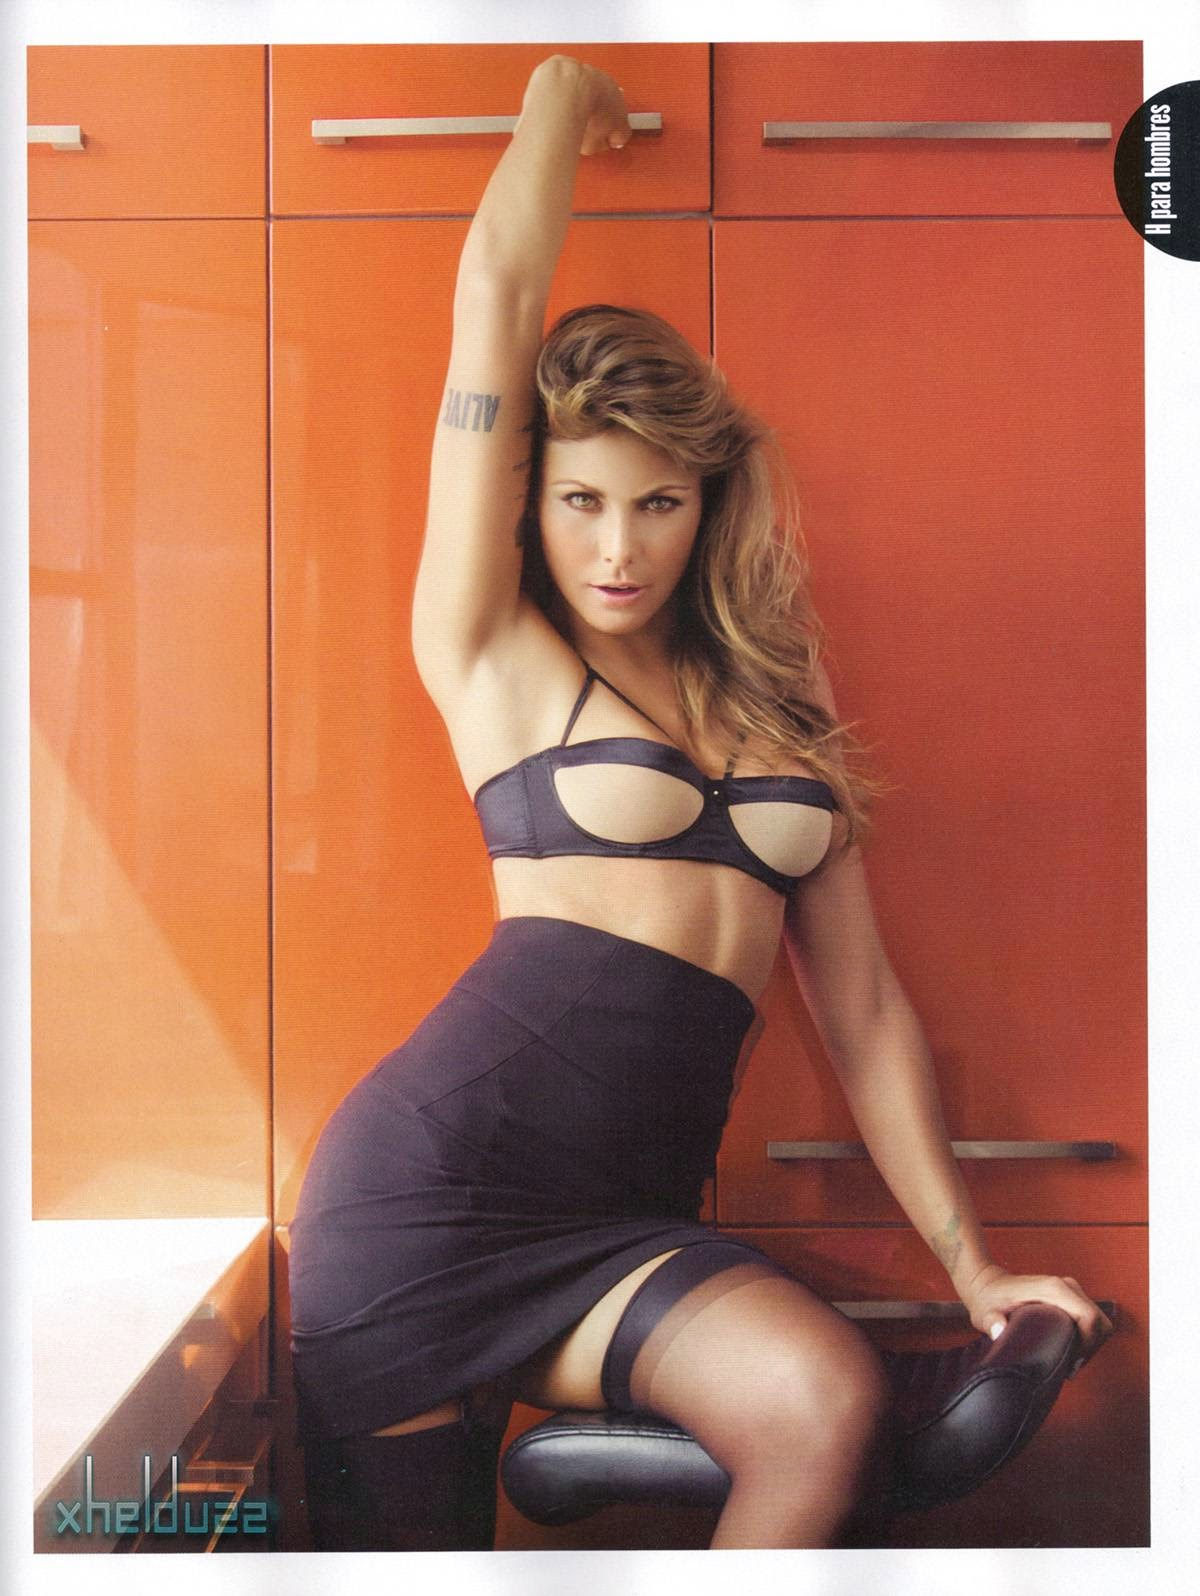 Amanda Rosas H Extremo Revista   Search Results   Calendar 2015